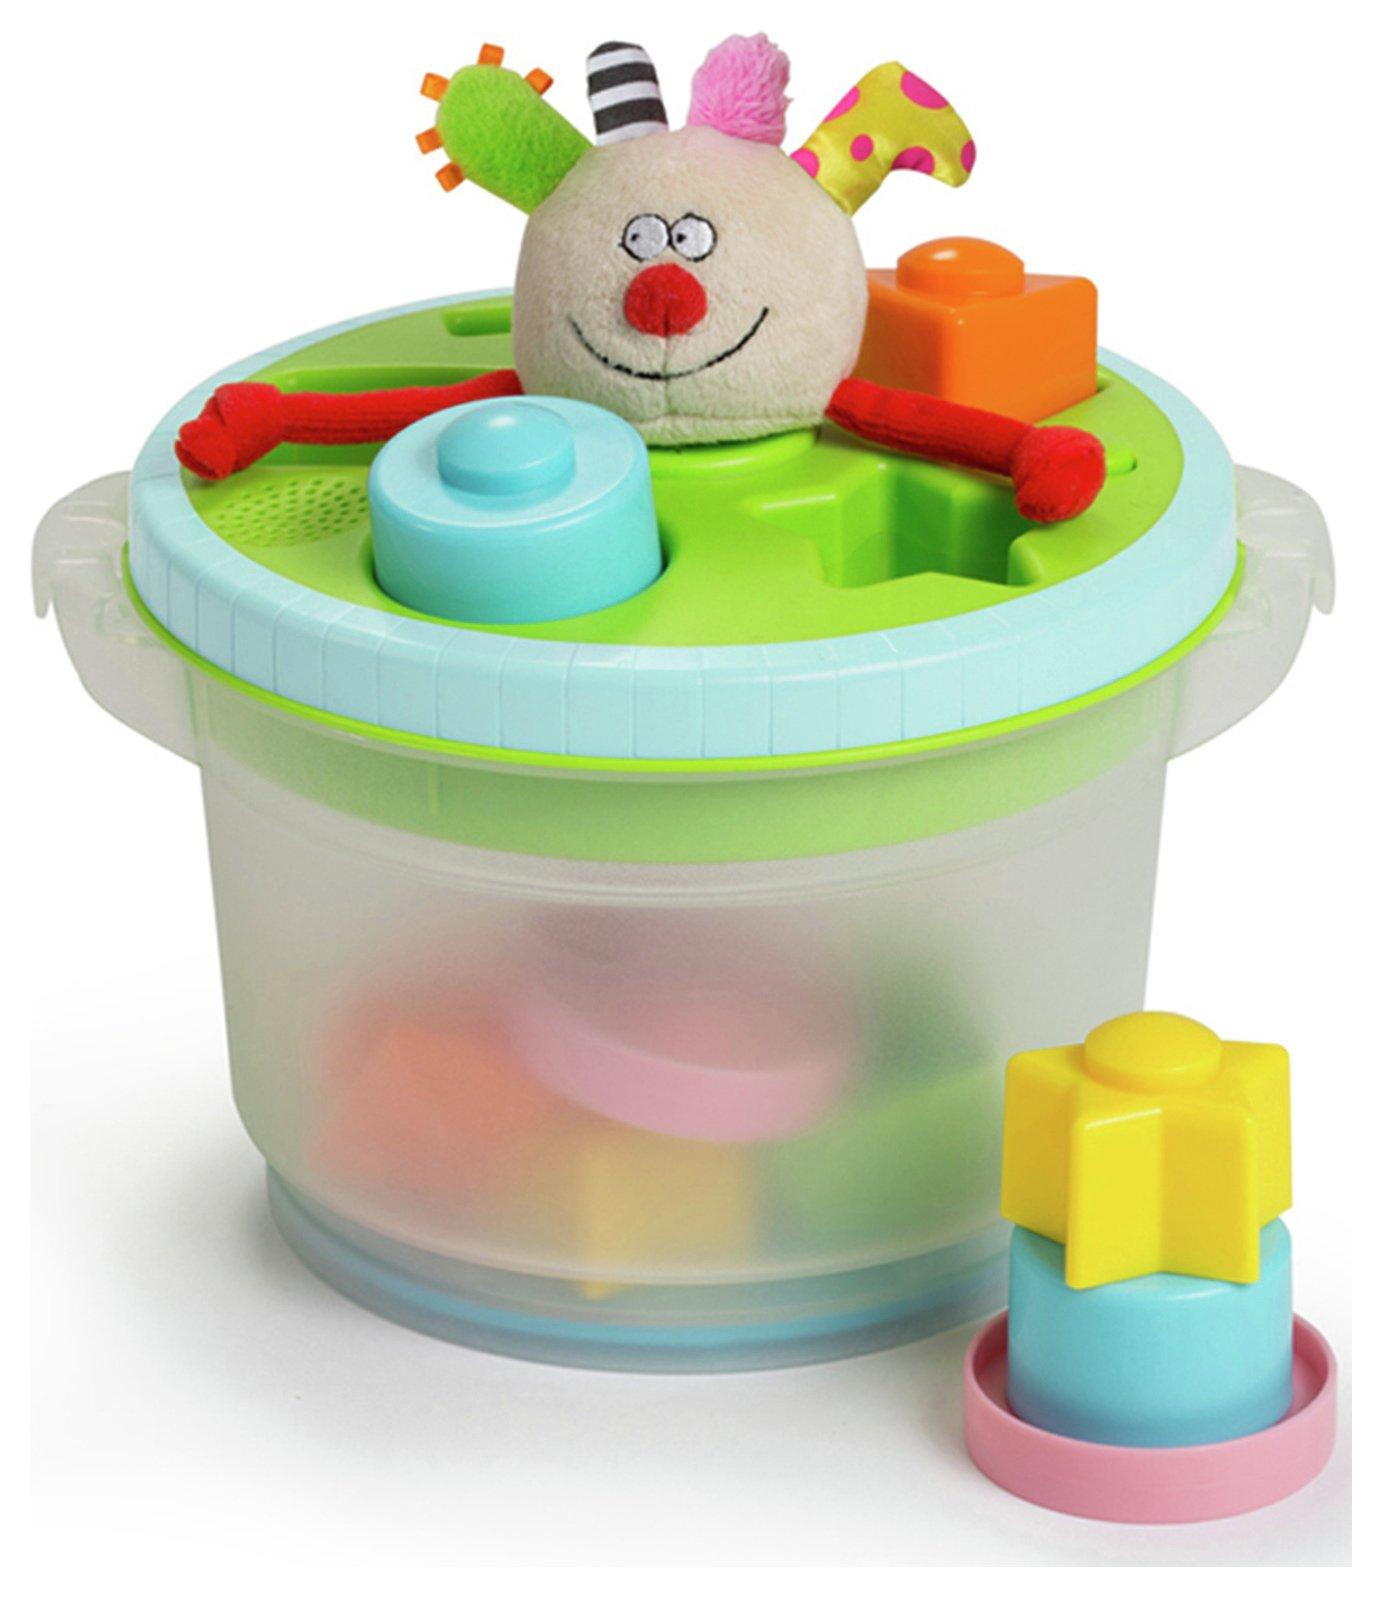 Image of Taf Toys Kooky Musical Sorter